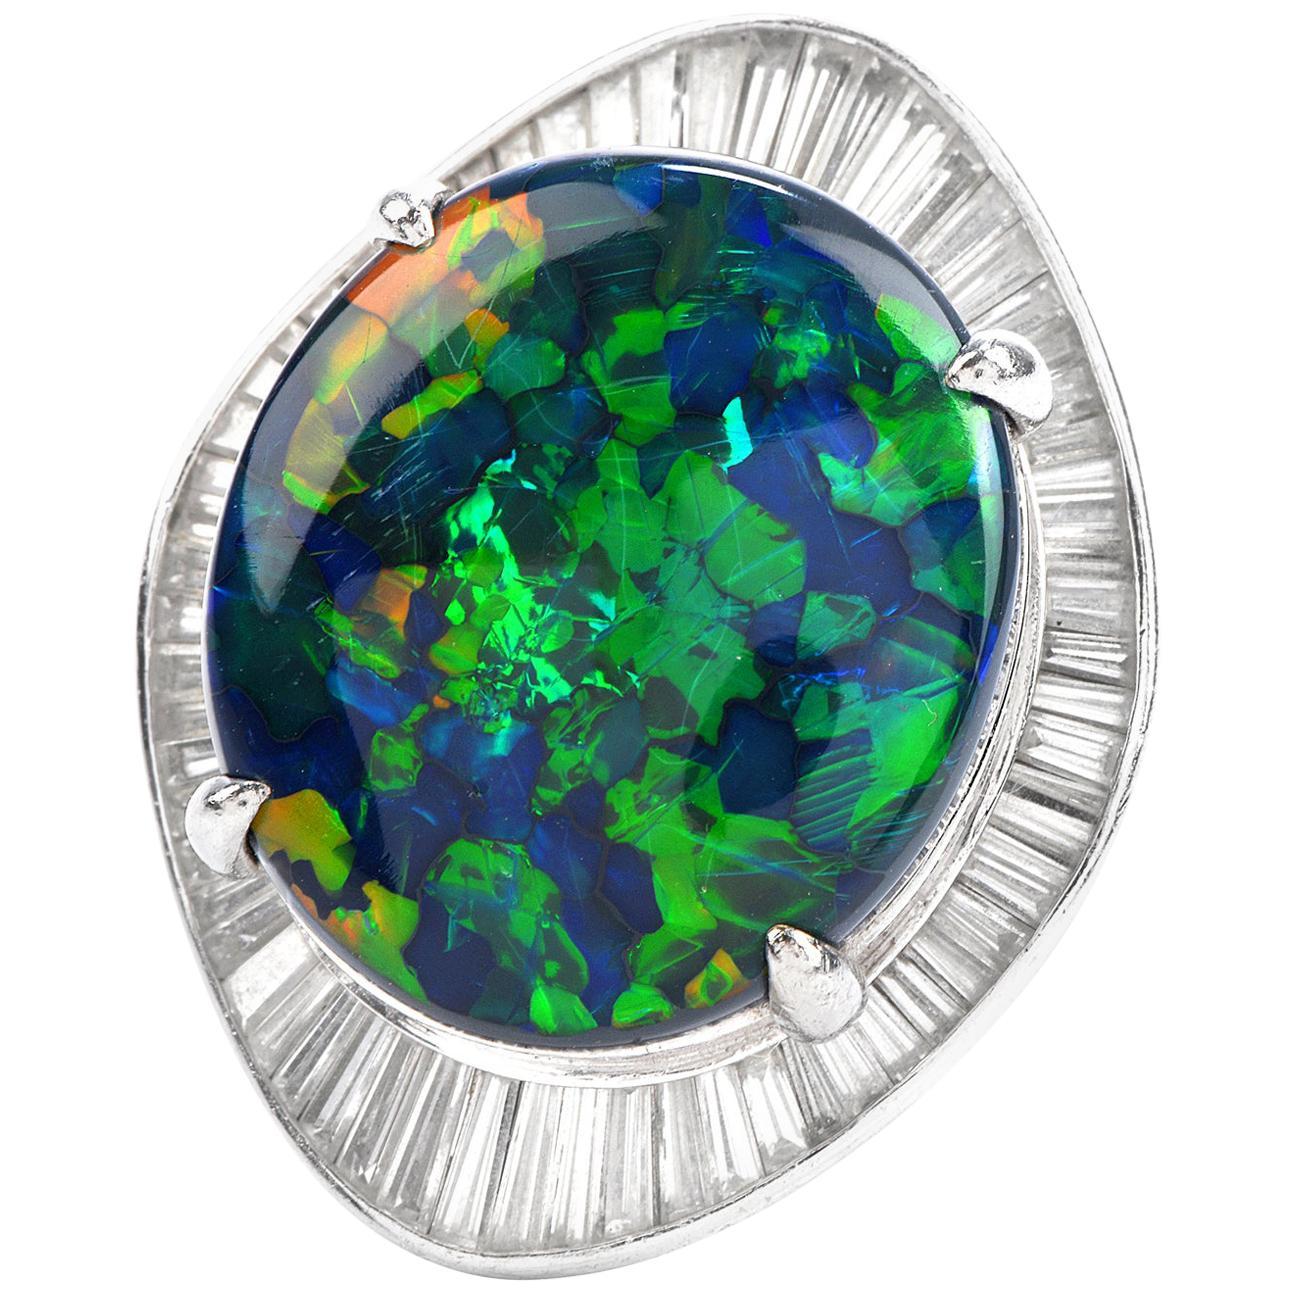 1980s GIA Large Black Opal Diamond Platinum Cocktail Ballerina Ring